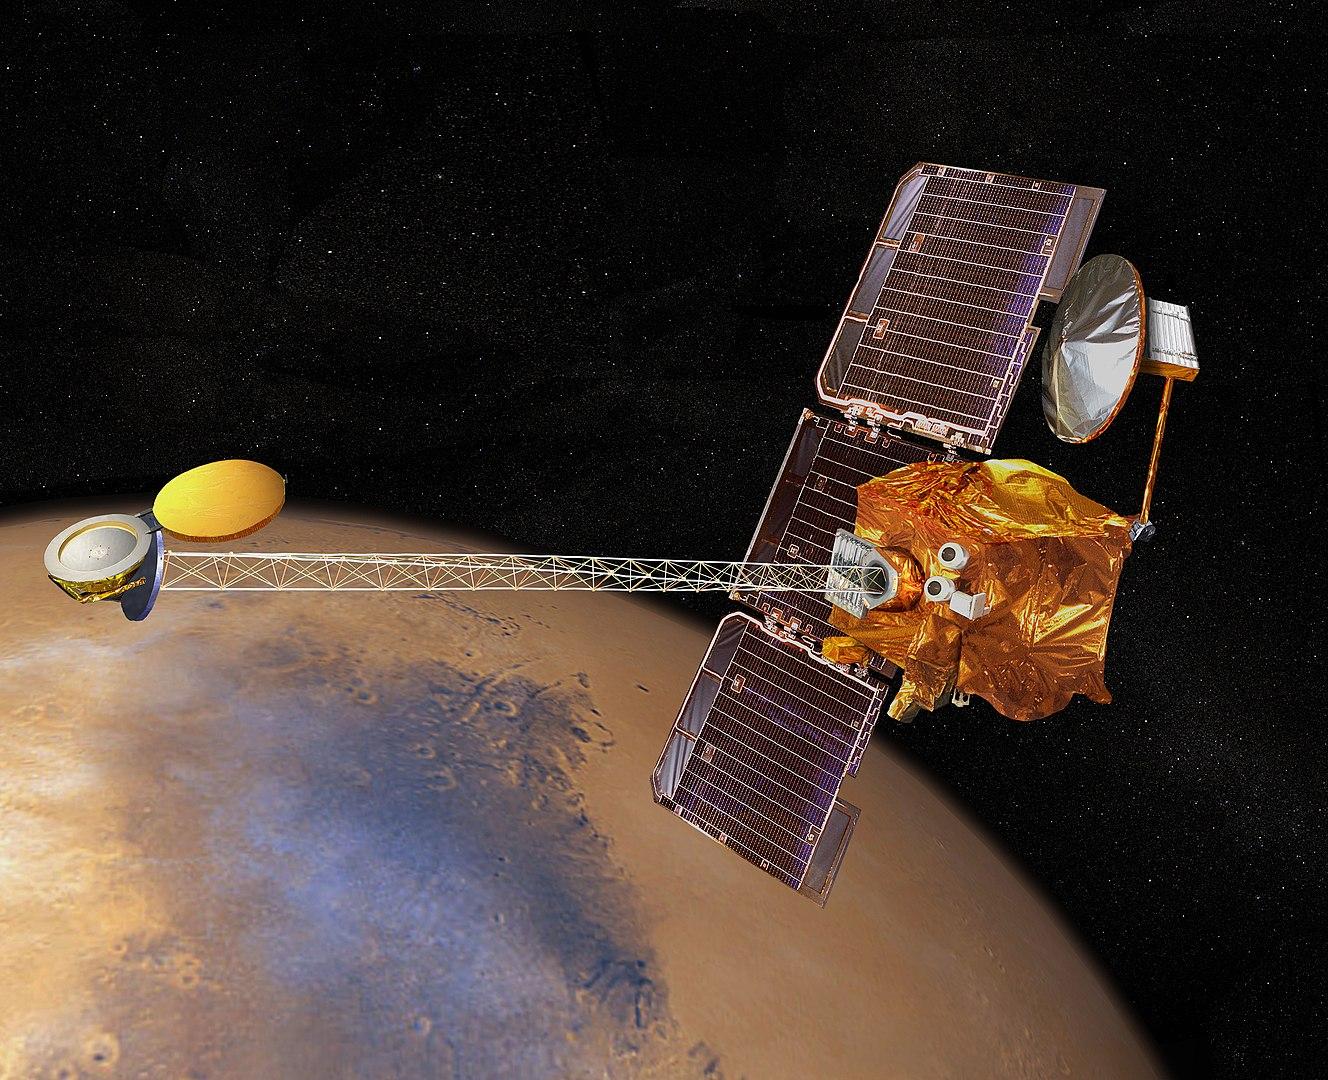 Artist's concept of 2001 Mars Odyssey orbiting Mars